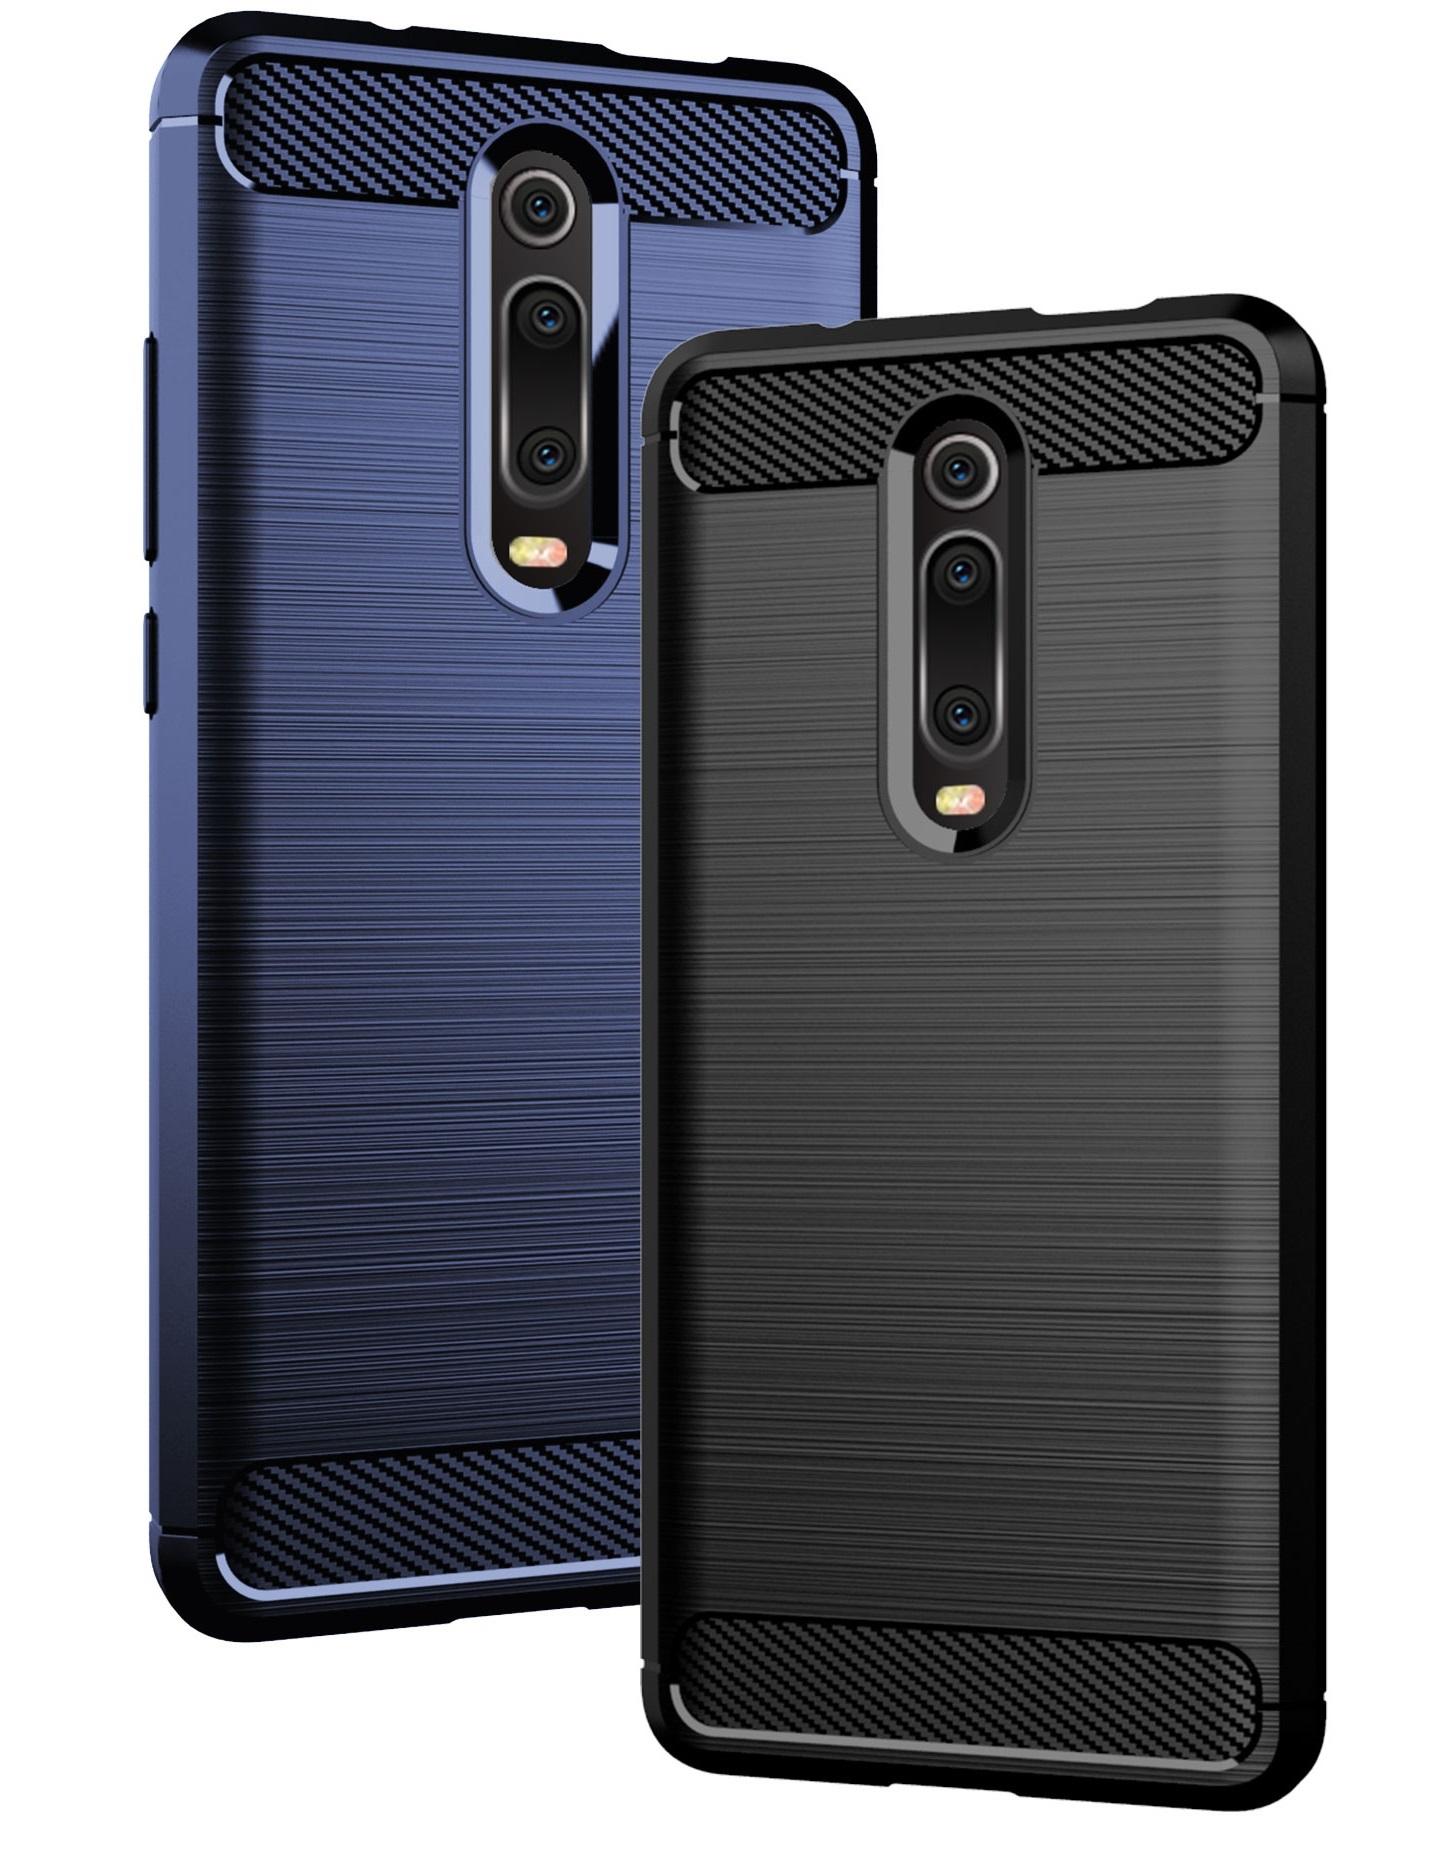 Чехол для Xiaomi Mi 9T (9T Pro, Redmi K20, K20 Pro,K20 Pro Premium) цвет Blue (синий), серия Carbon от Caseport